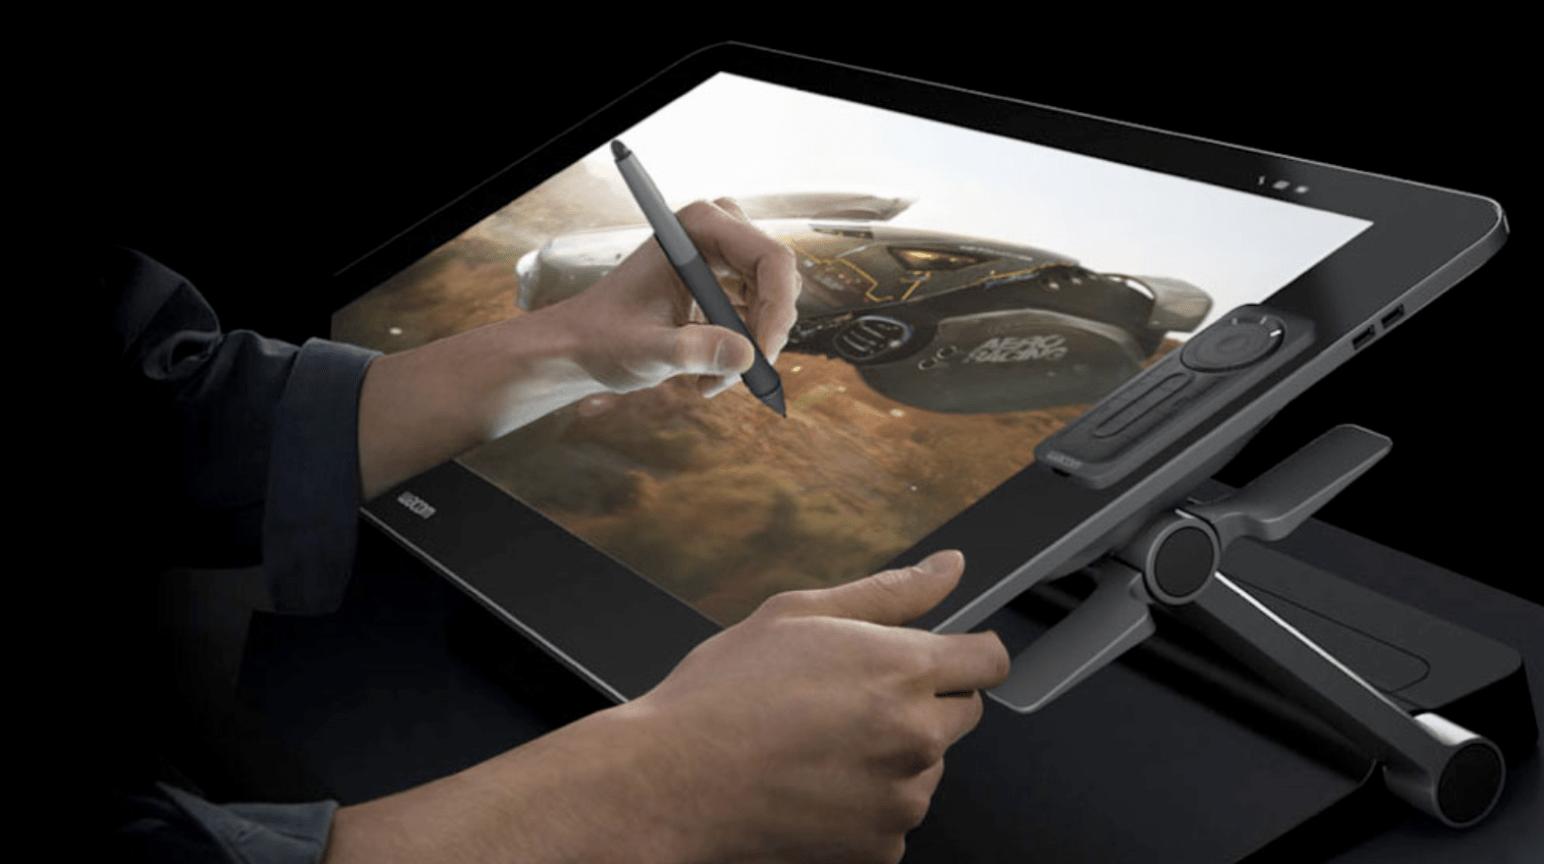 Wacom Cintiq 27HD Drawing as a product designer the design sketchbook